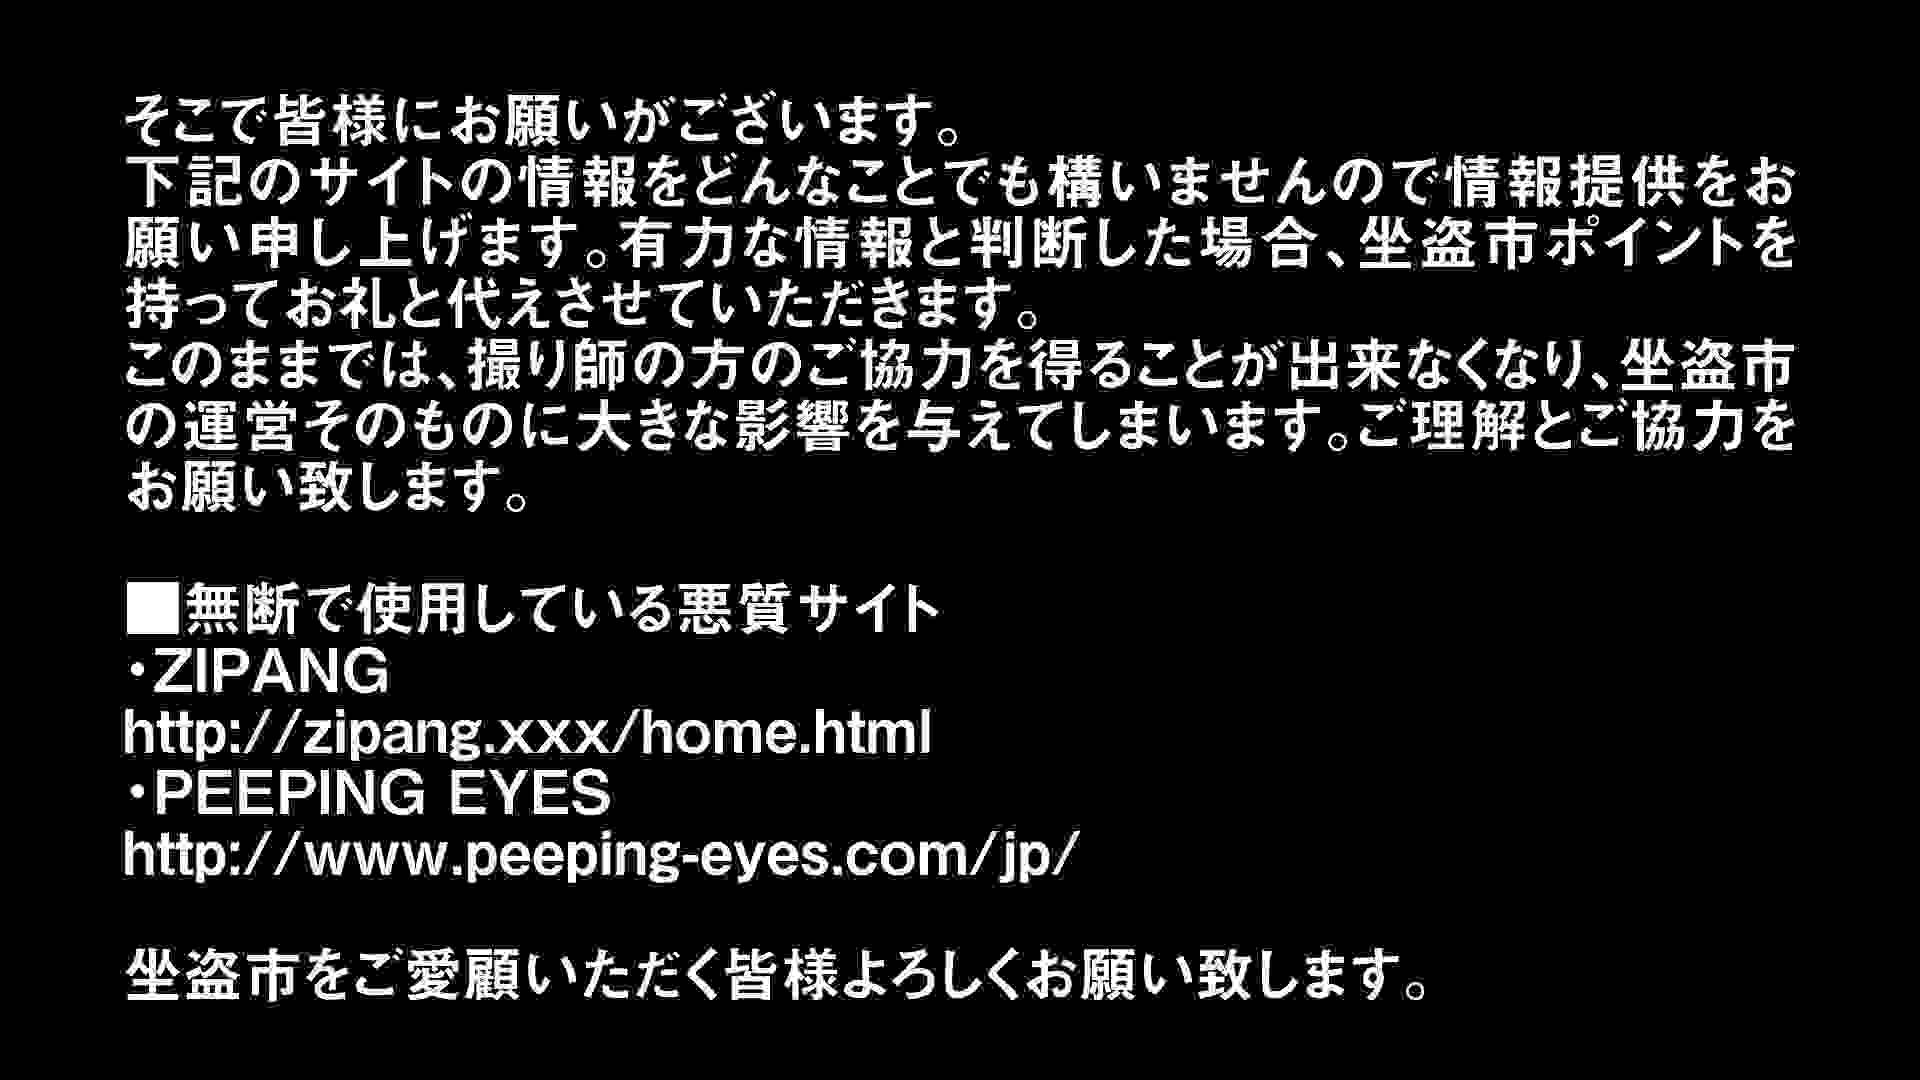 Aquaな露天風呂Vol.300 盗撮シリーズ | 露天風呂編  110PIX 37